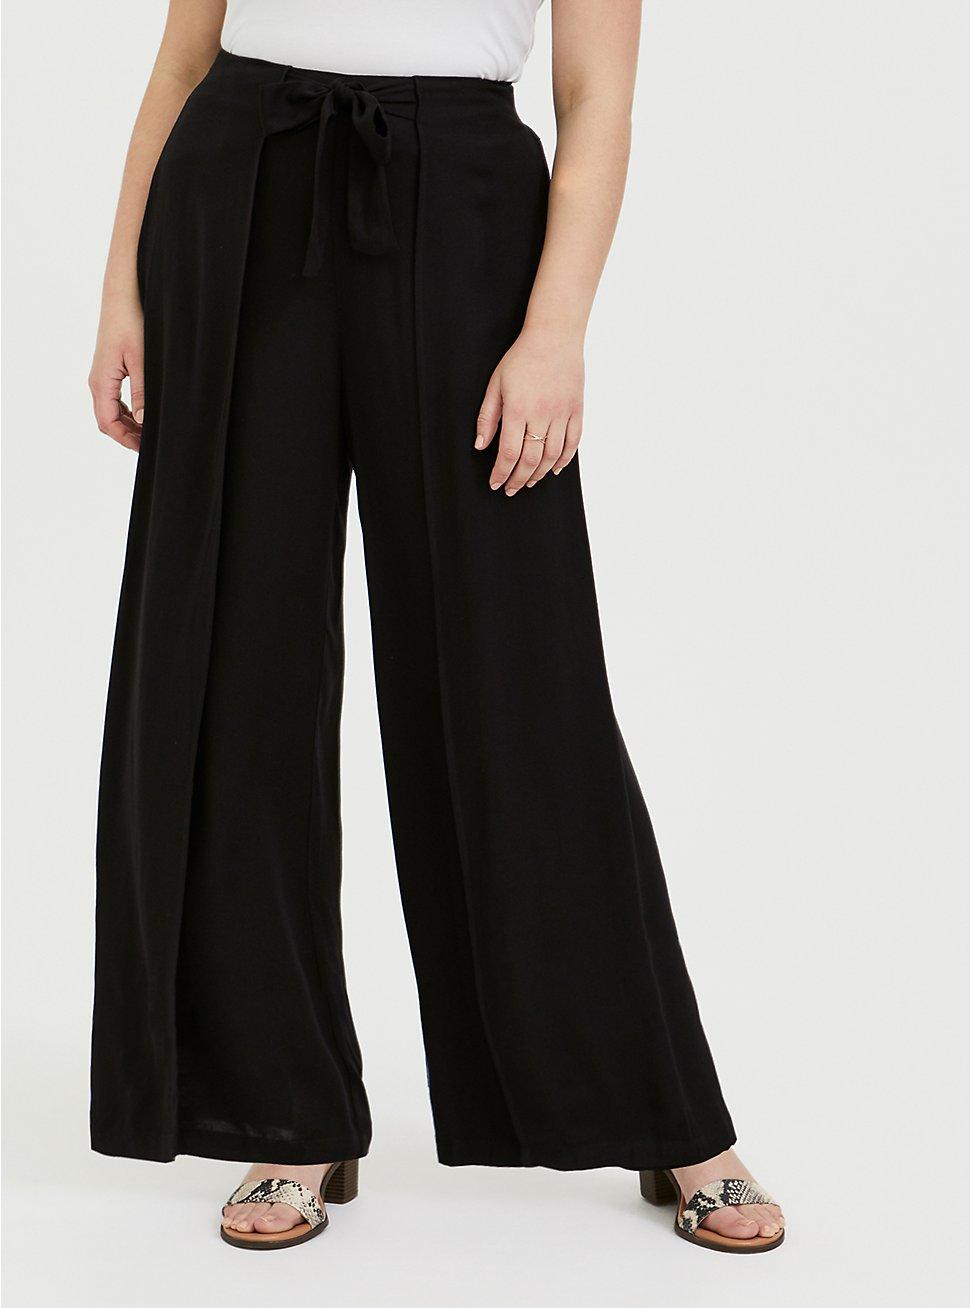 Black Crepe Pleated Drawstring Wide Leg Pant -, DEEP BLACK, hi-res